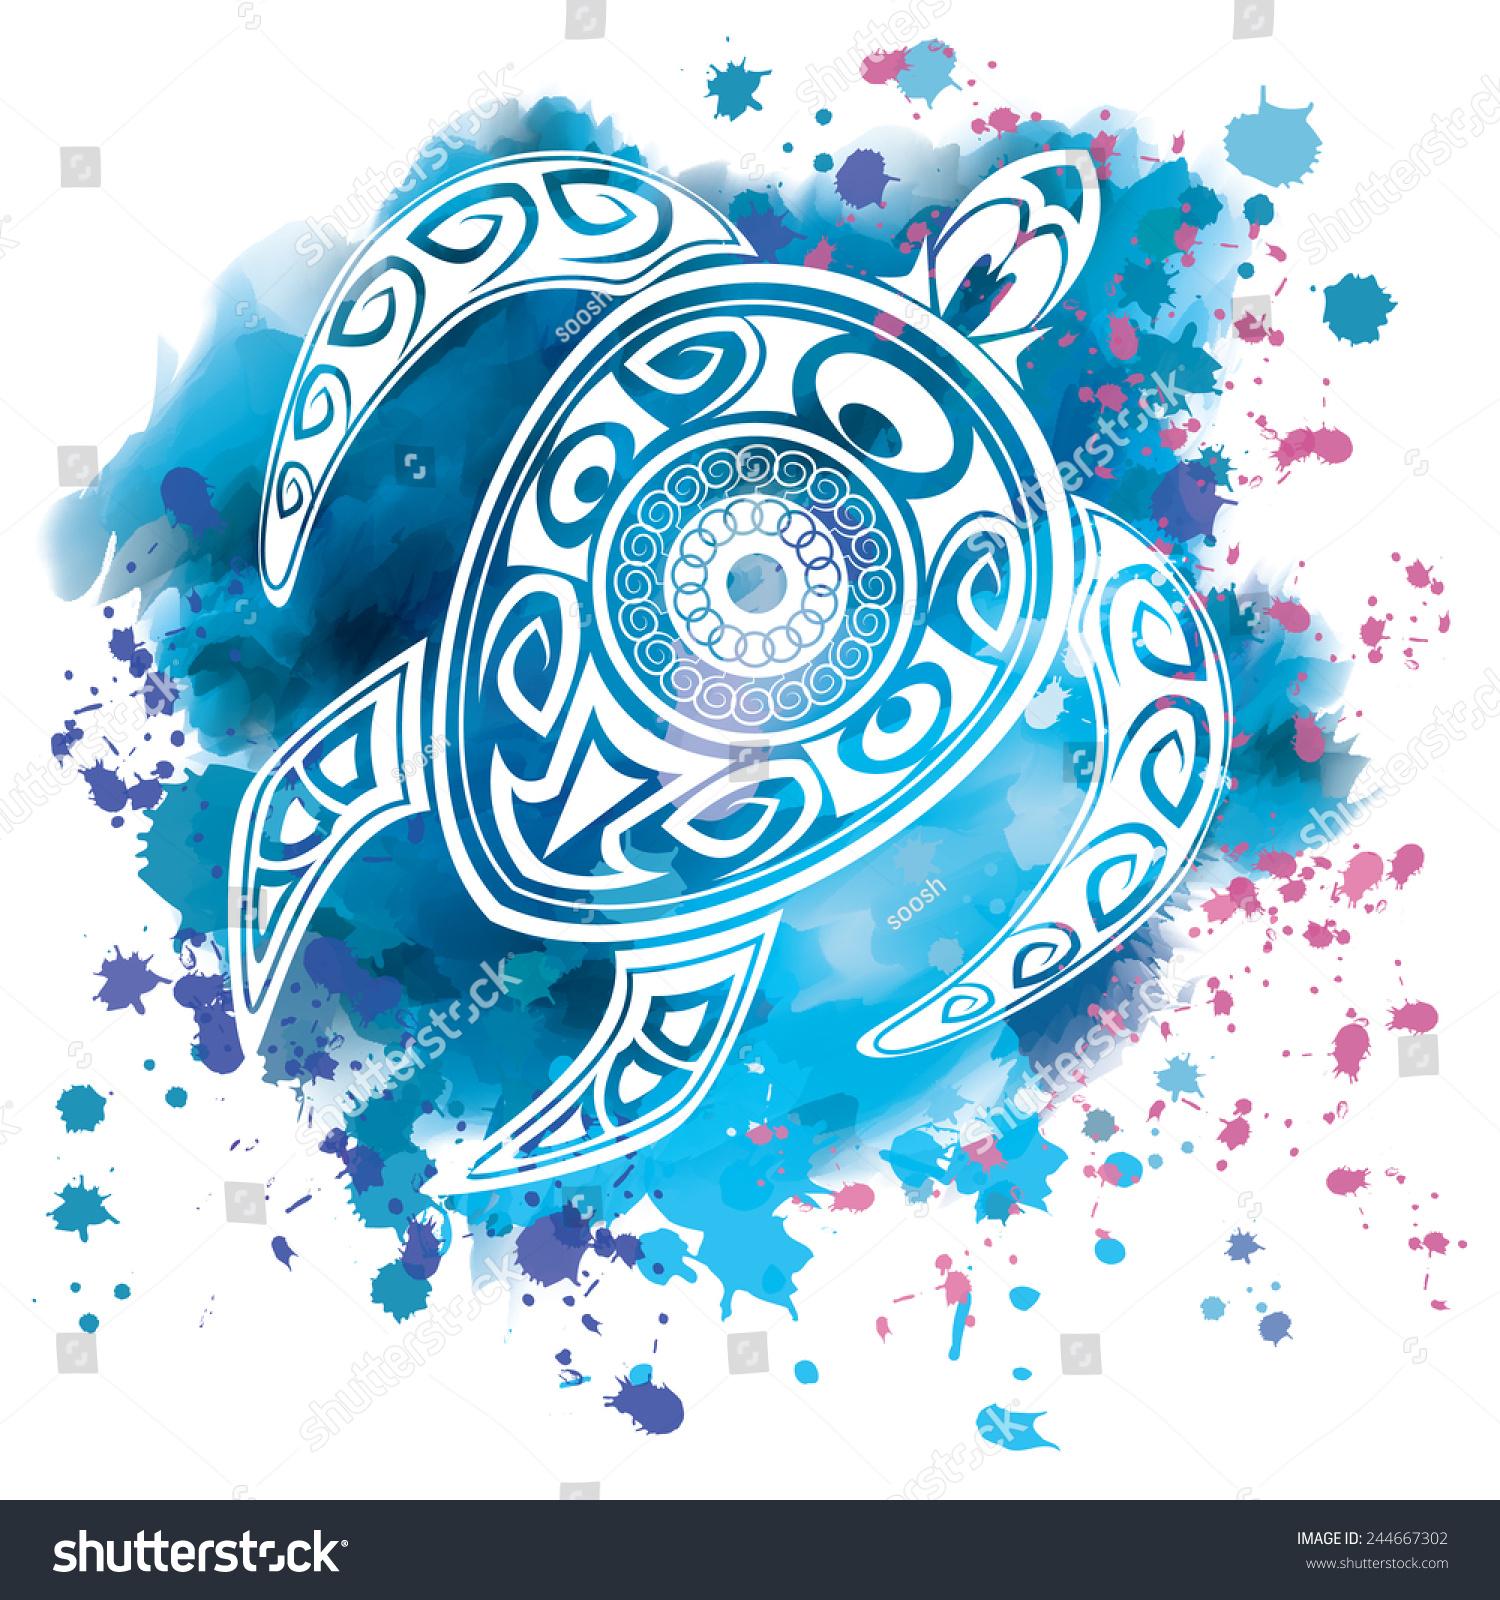 maori art iphone wallpaper - photo #20